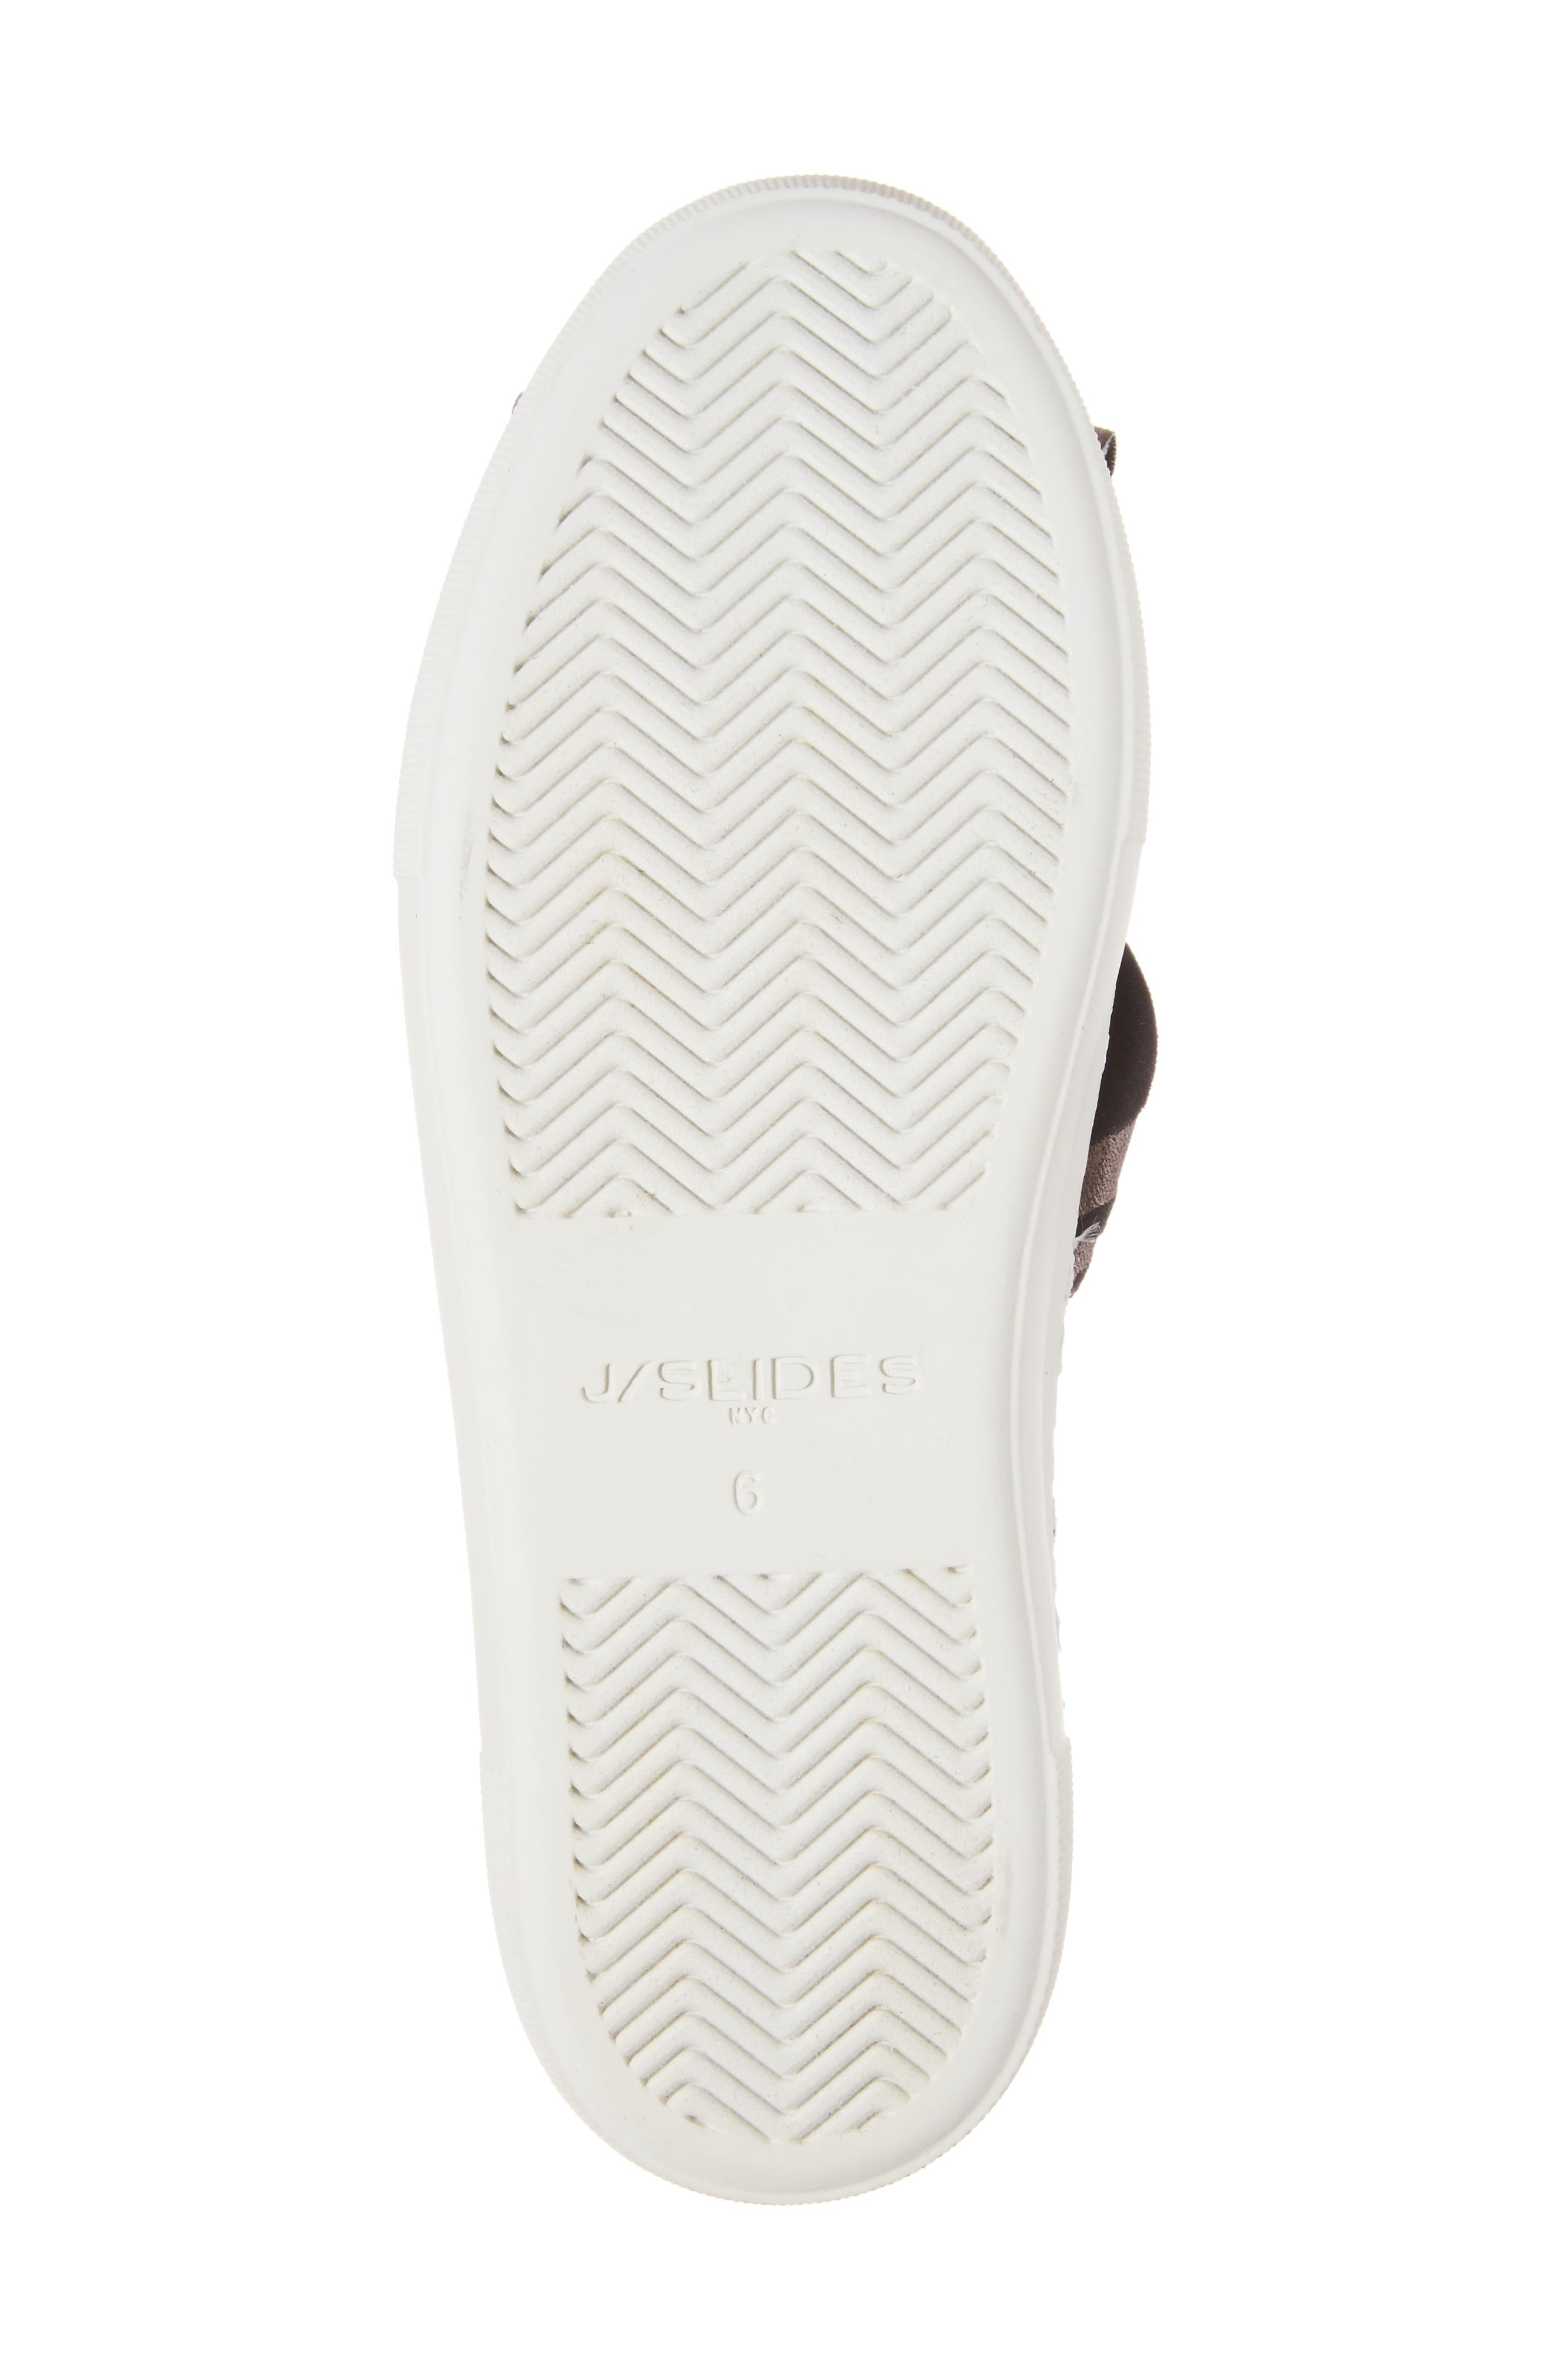 Audra Slip-On Sneaker,                             Alternate thumbnail 6, color,                             Black Camo Fabric